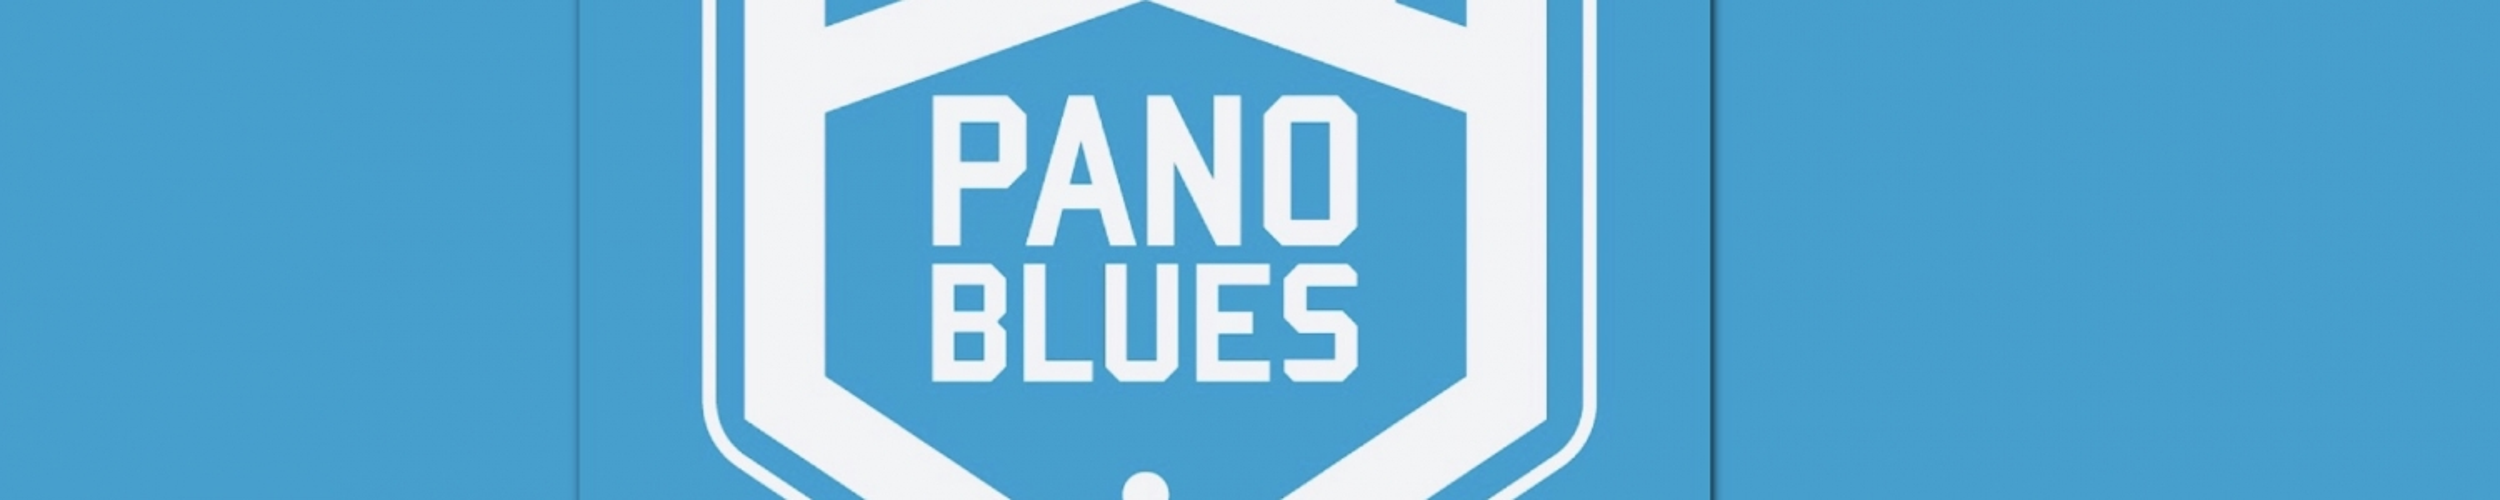 PanoBlues 2019